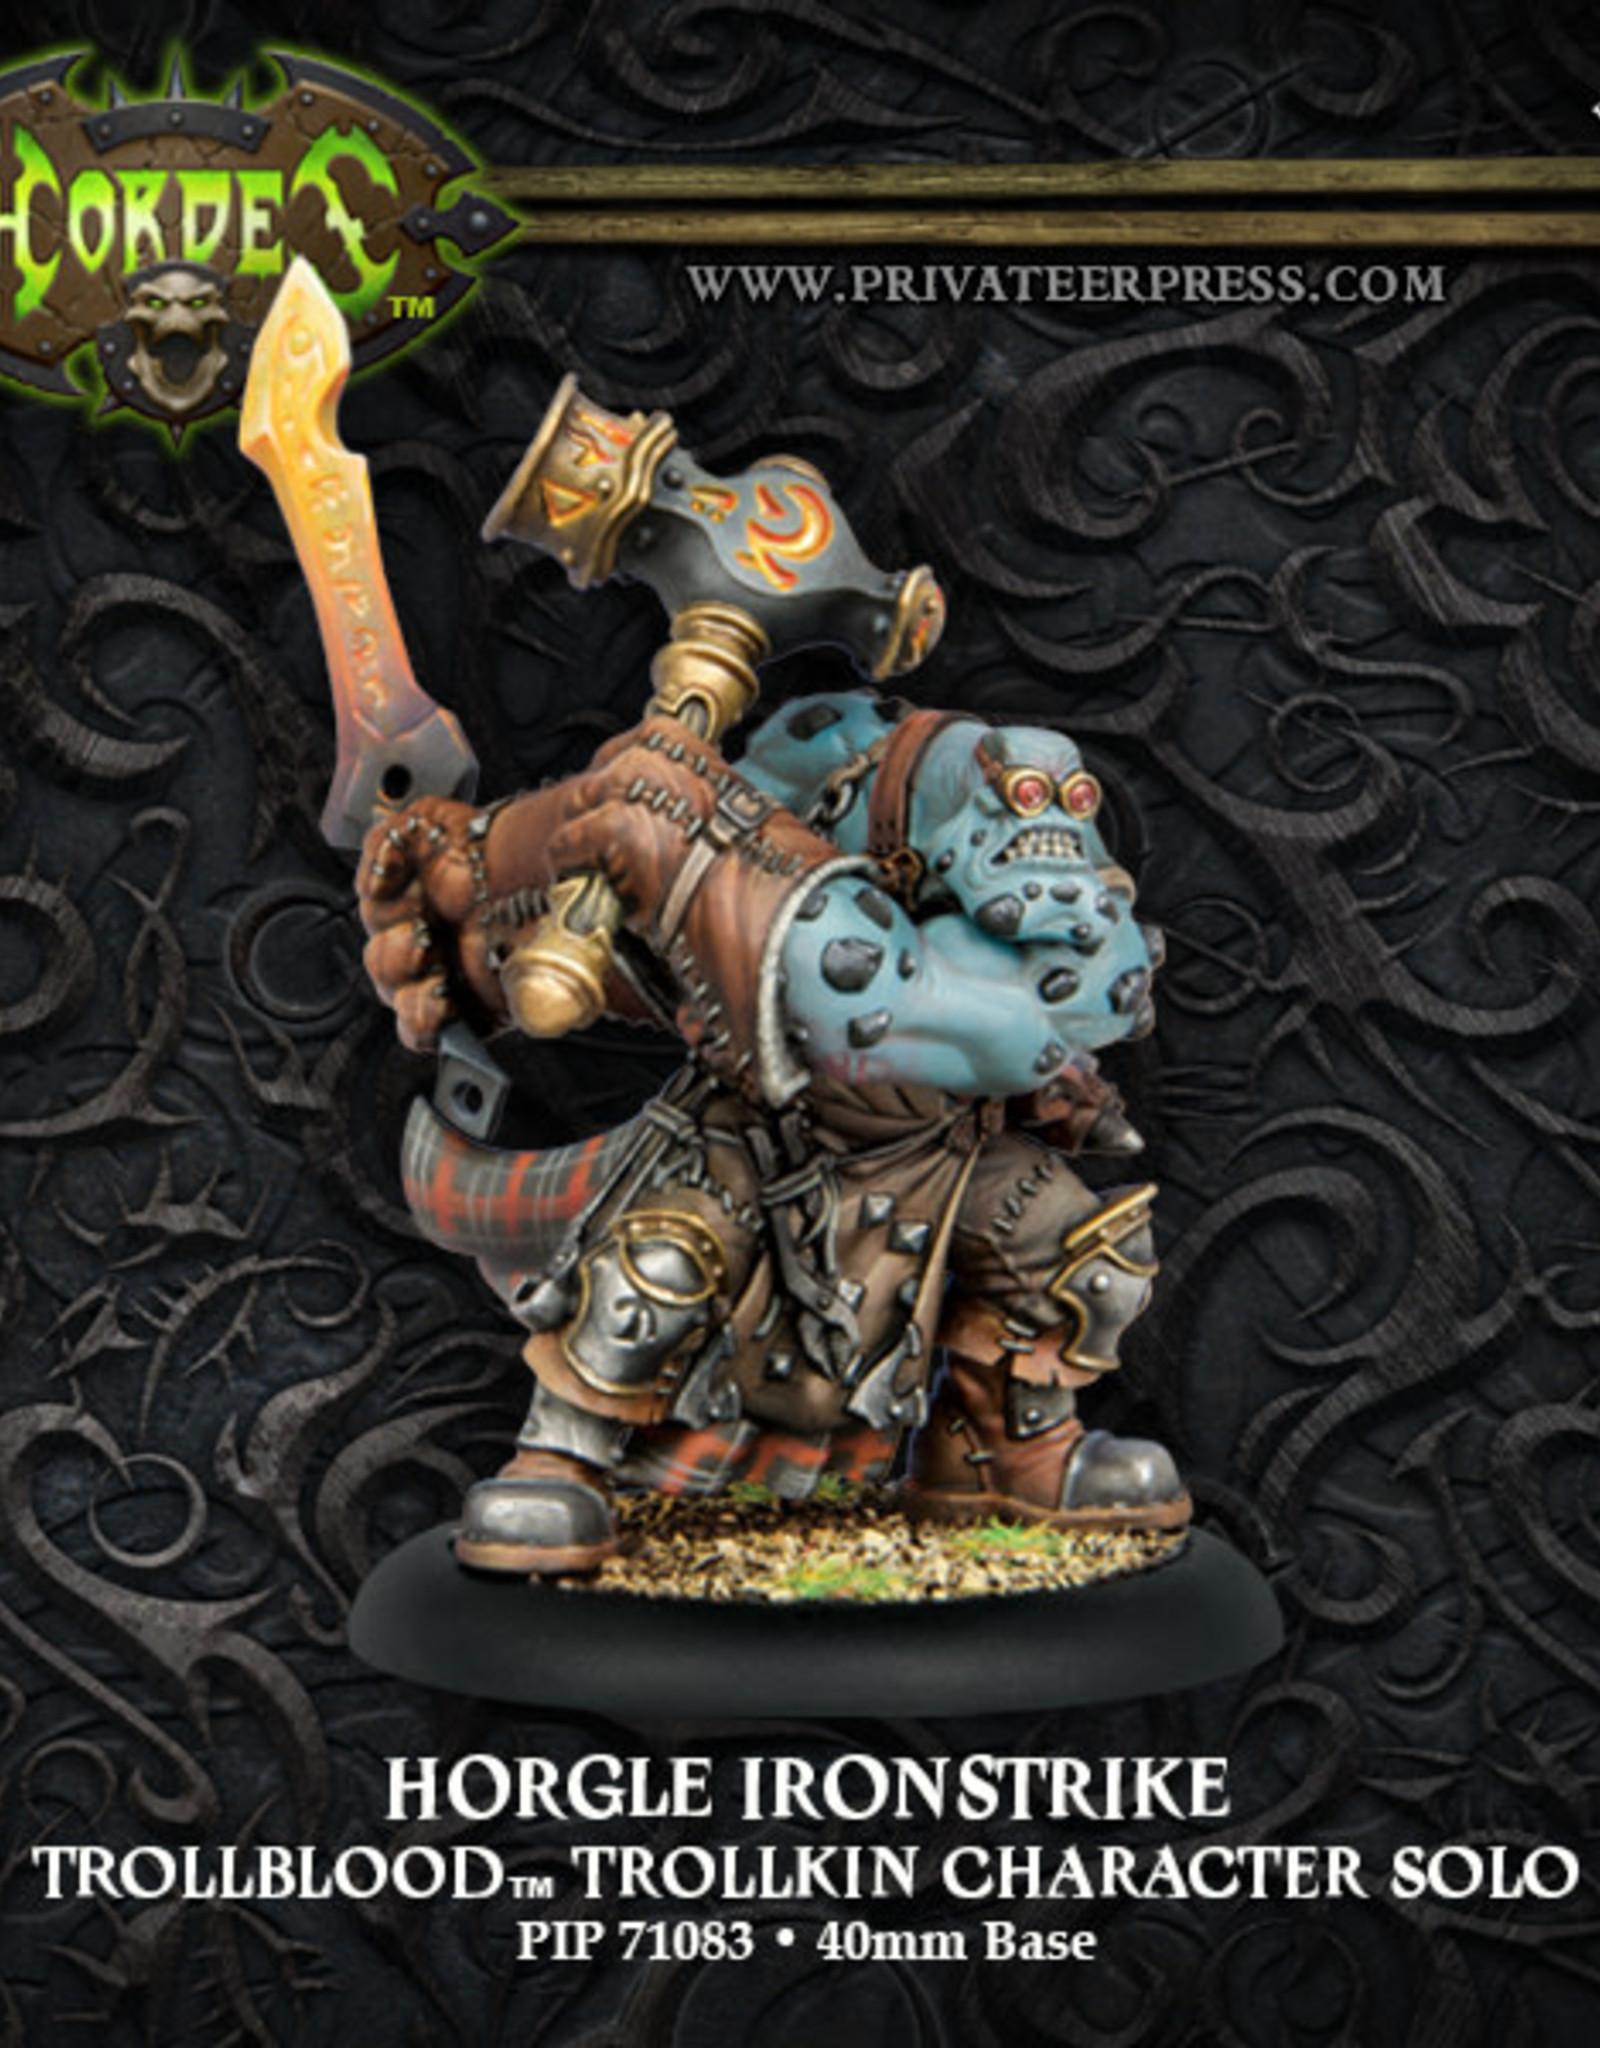 Hordes Trollbloods - Horgle Ironstrike